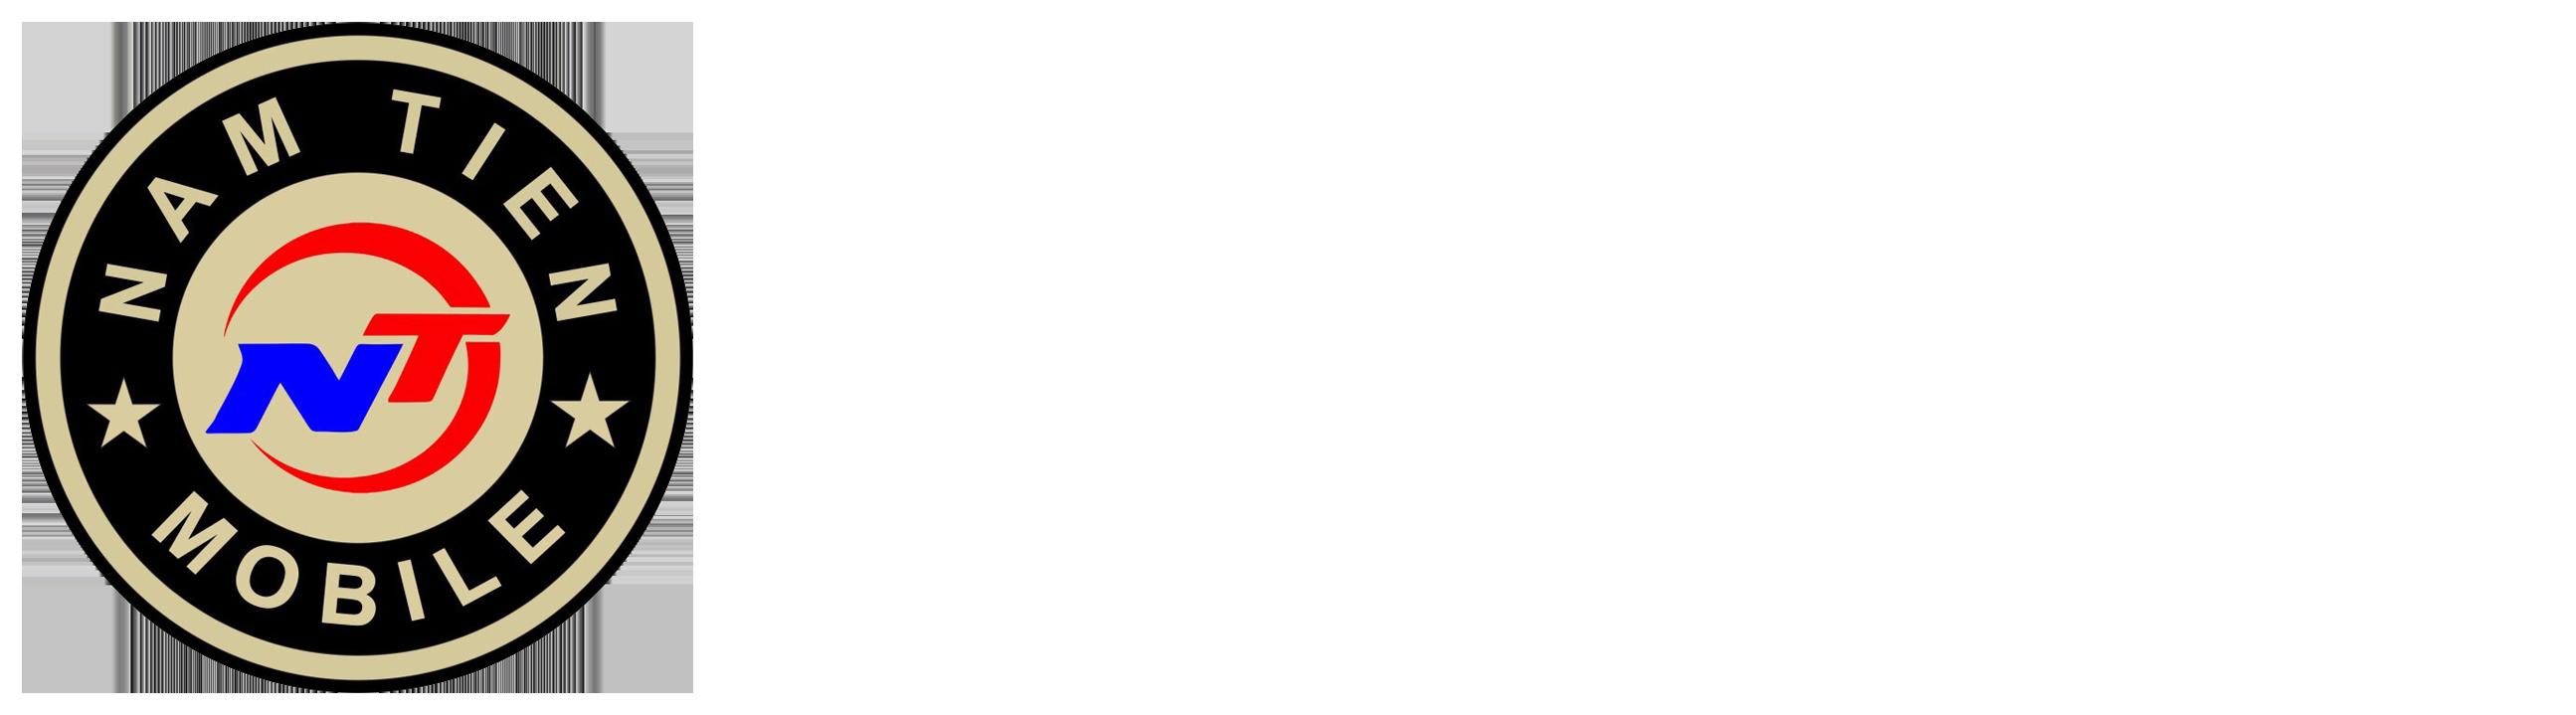 Nam Tiến Mobile